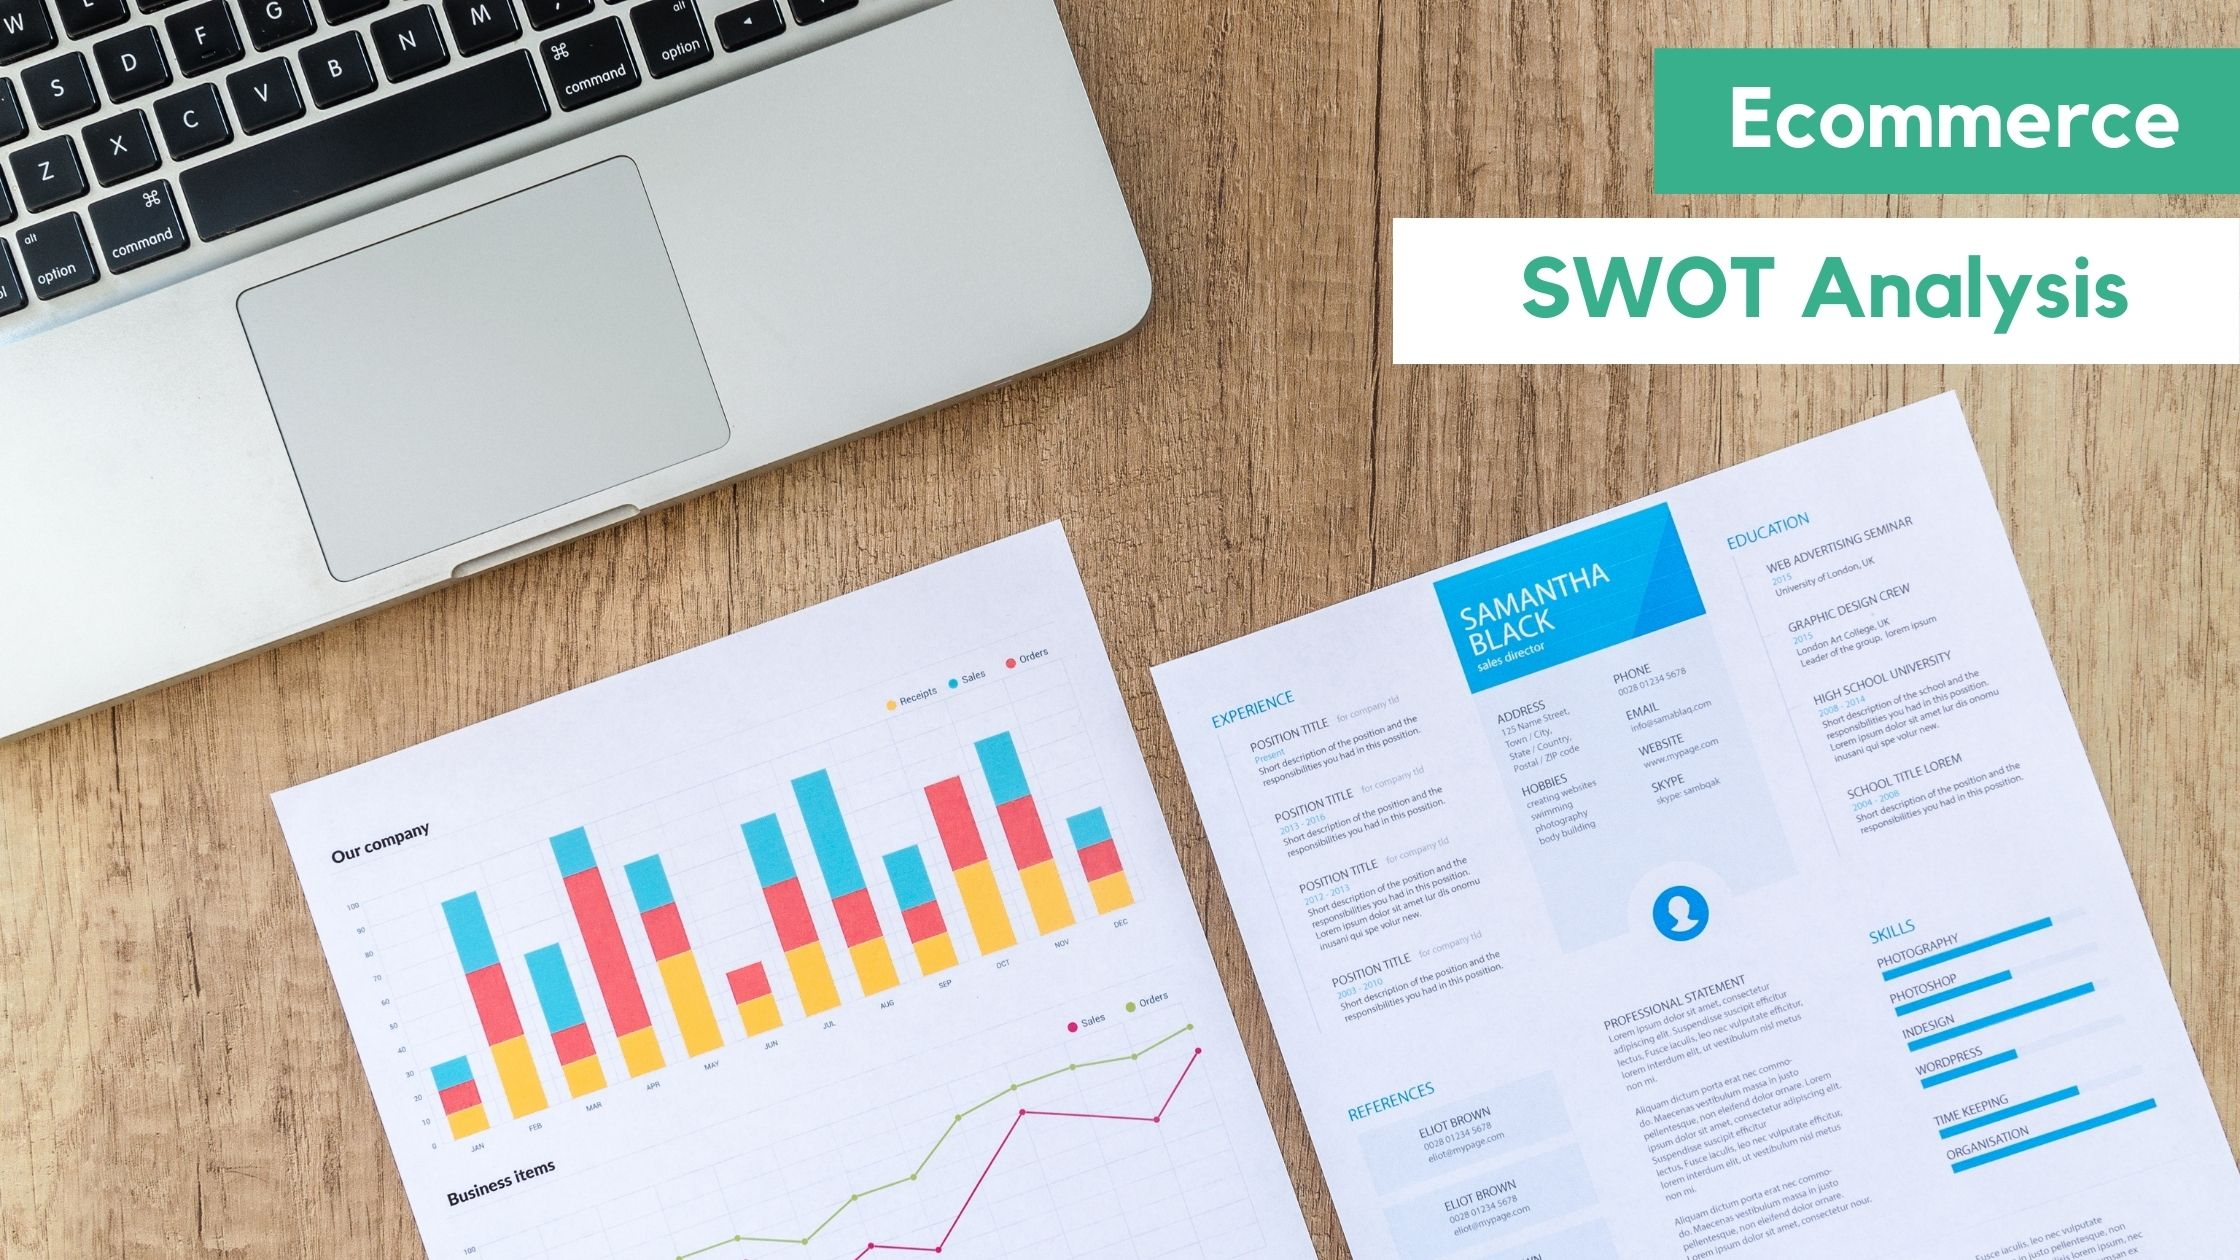 ecommerce swot analysis